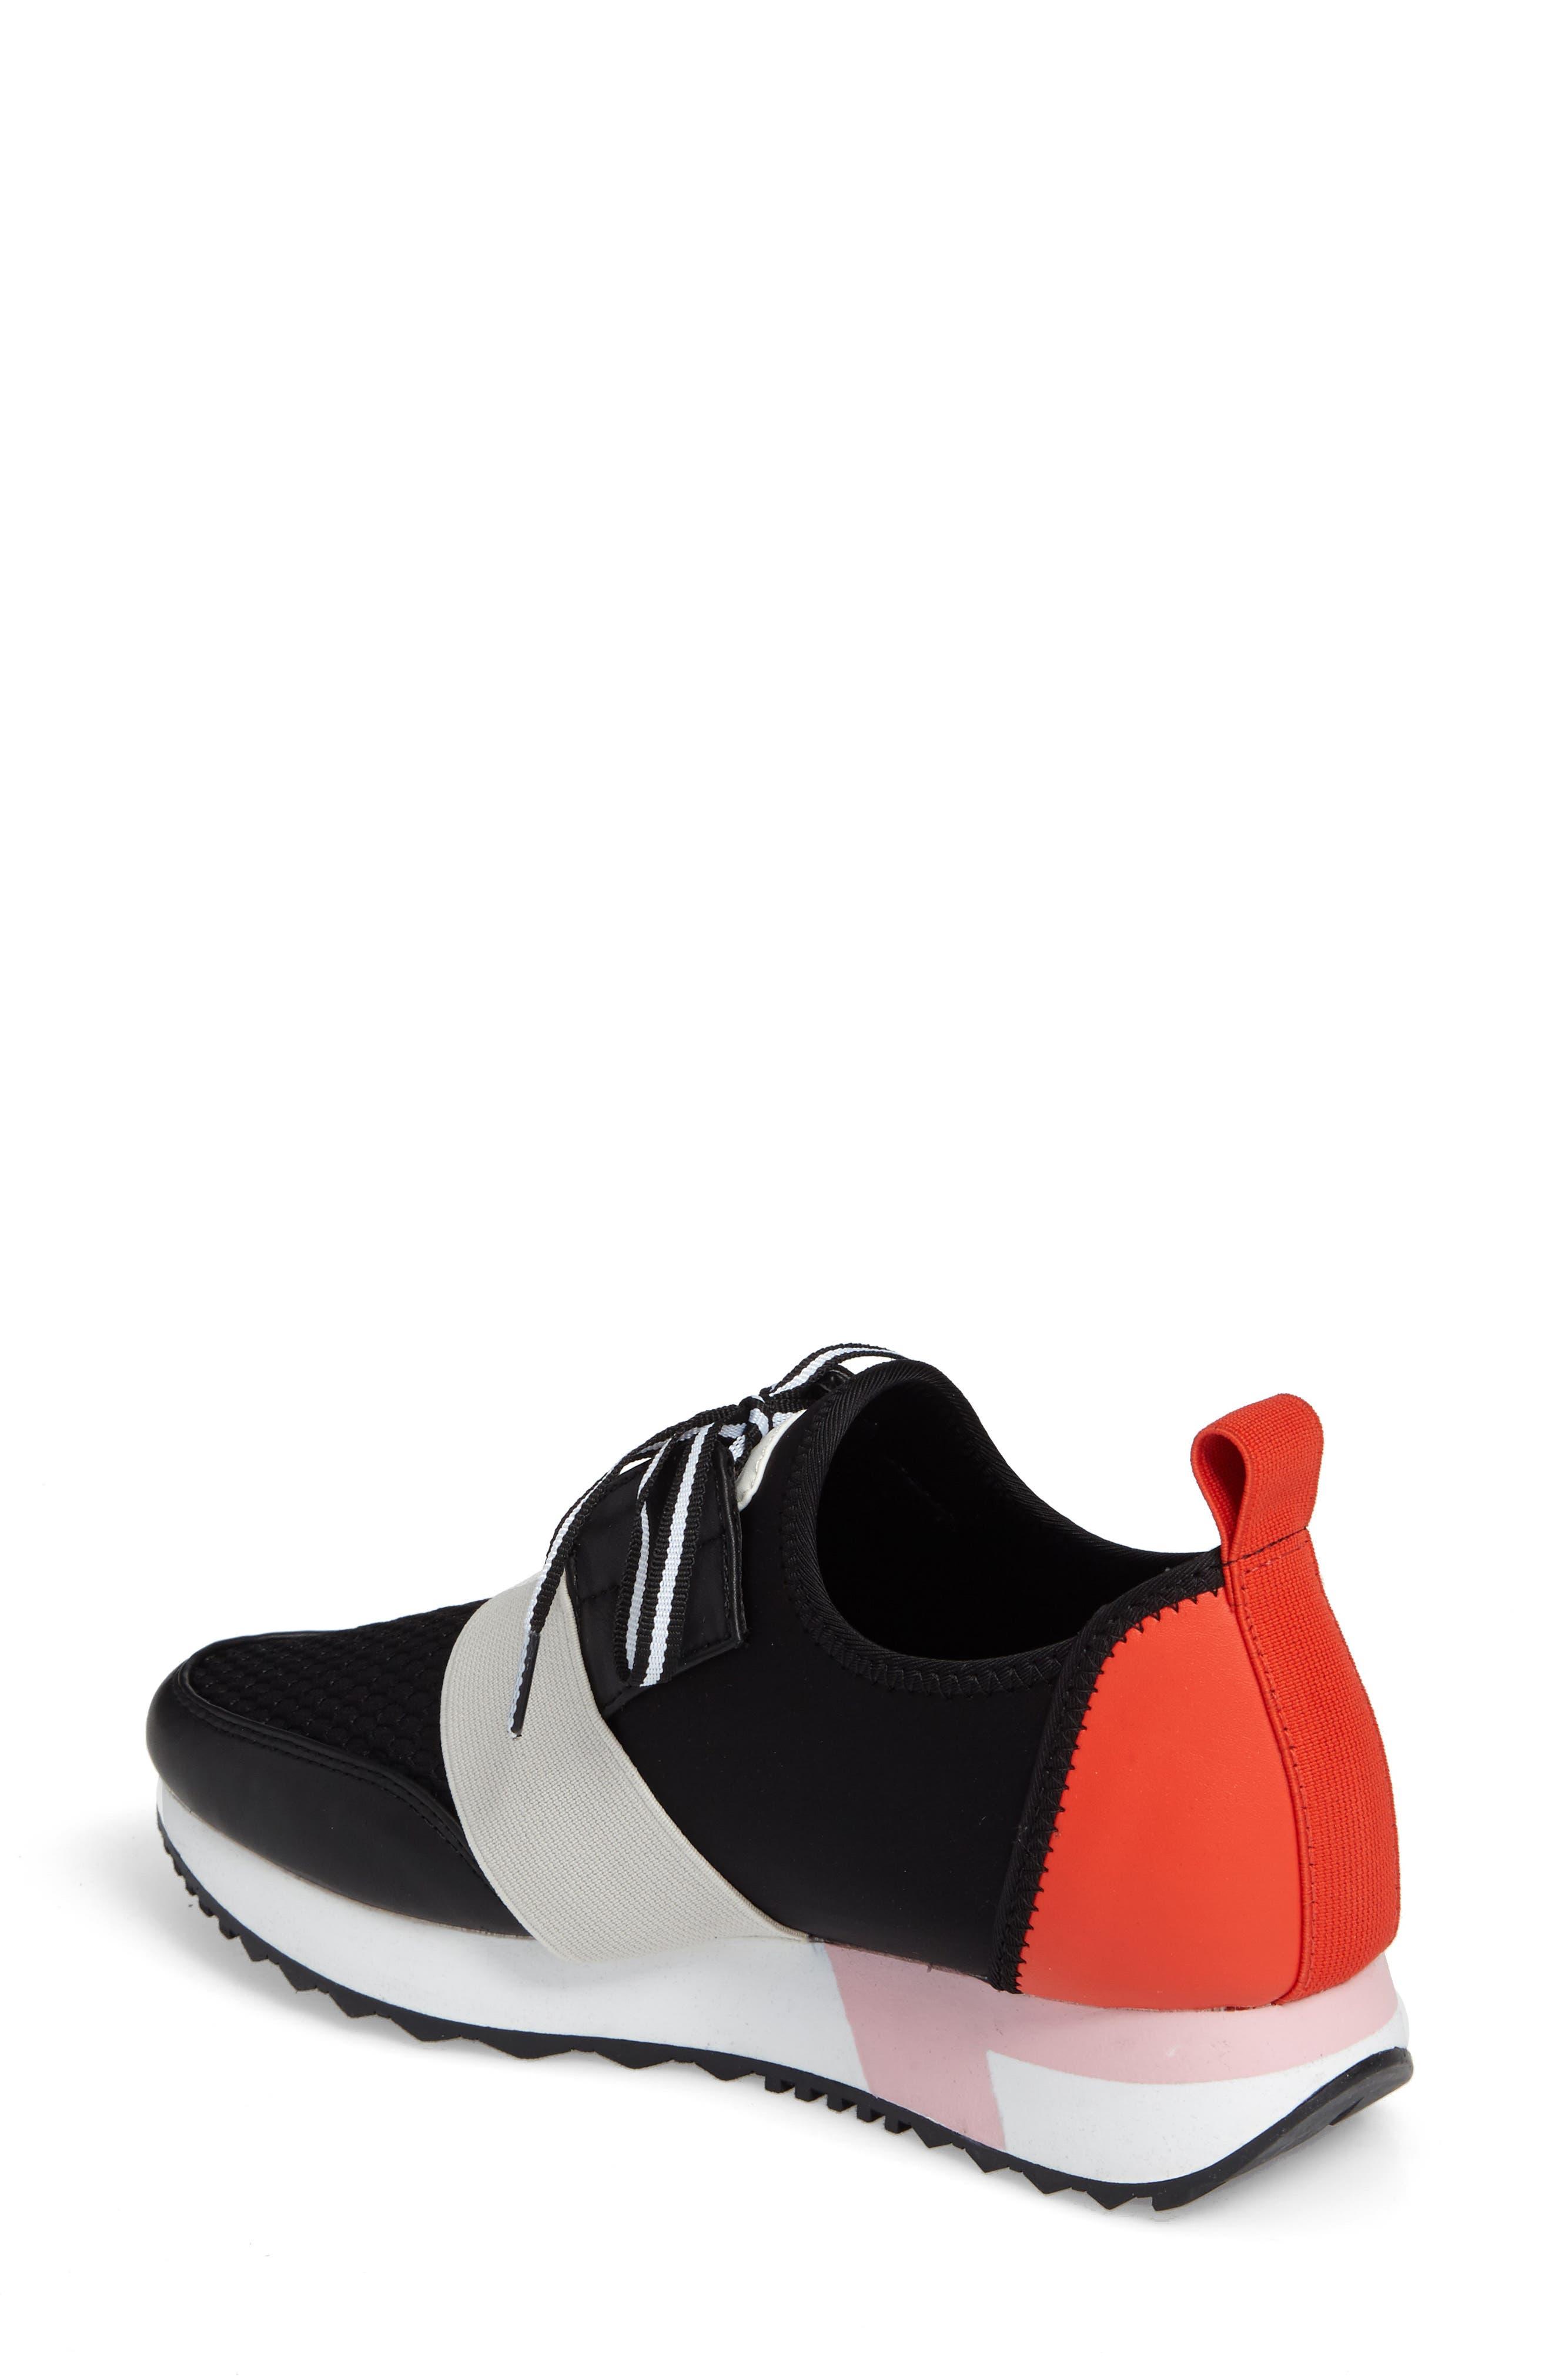 Antics Sneaker,                             Alternate thumbnail 2, color,                             015